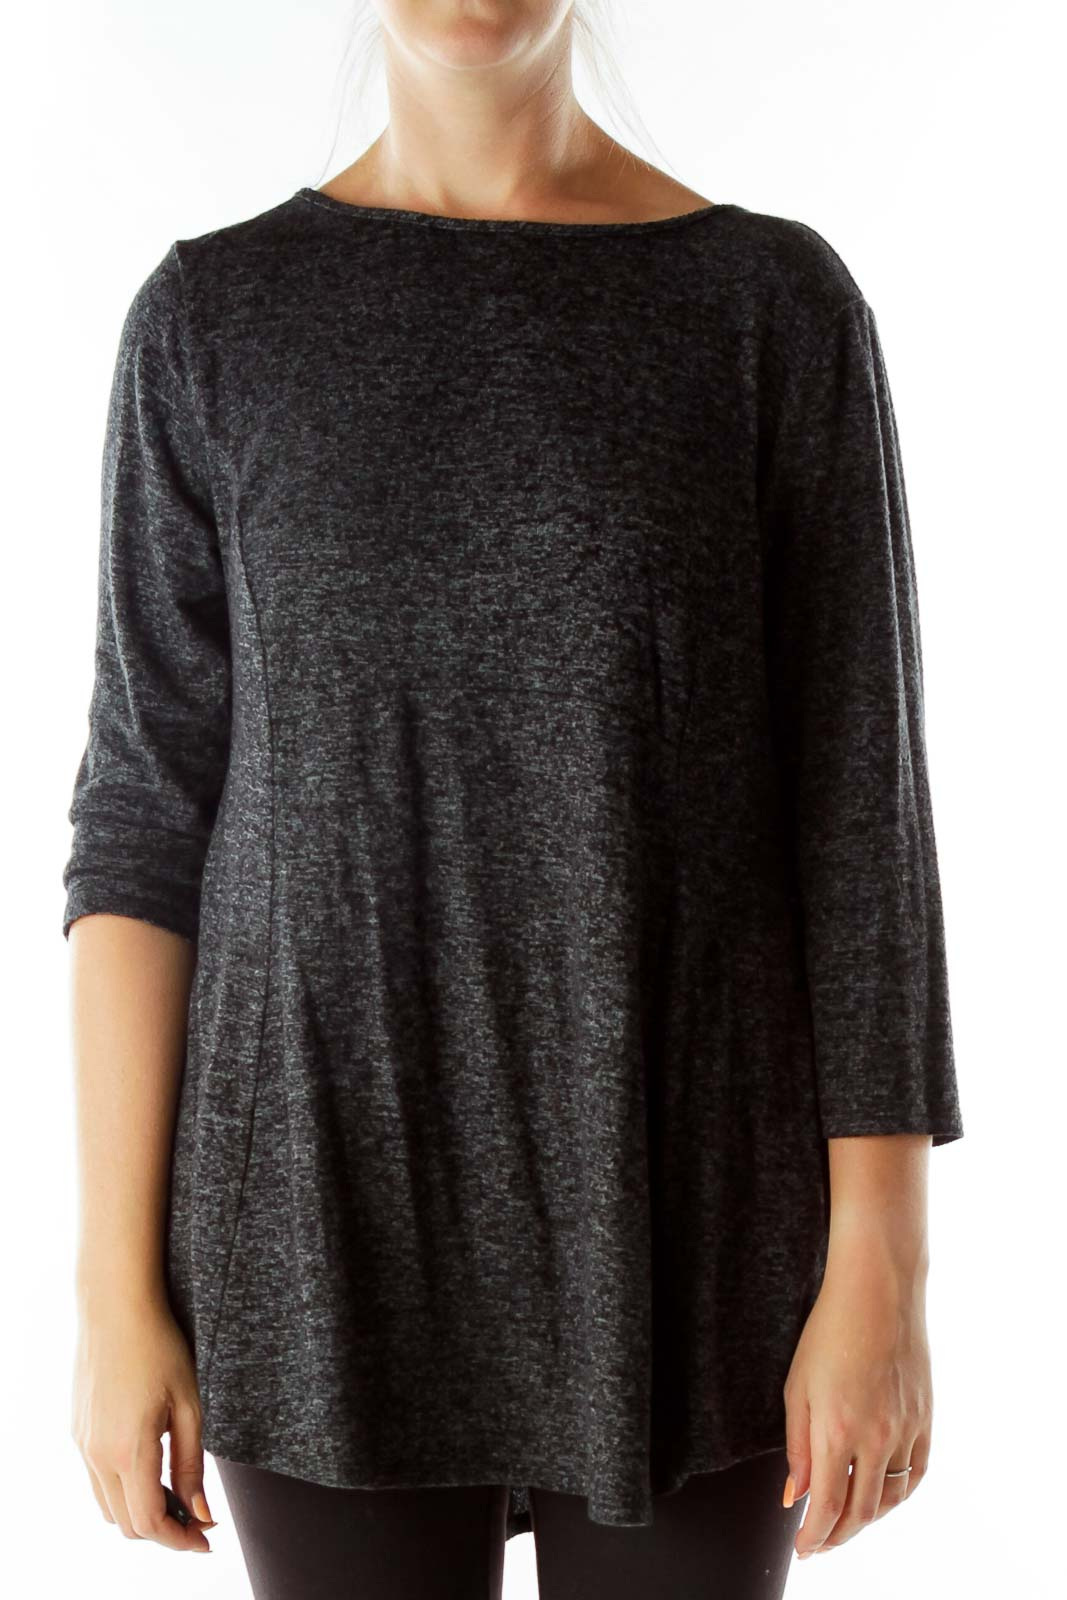 Gray Mottled Knit Top